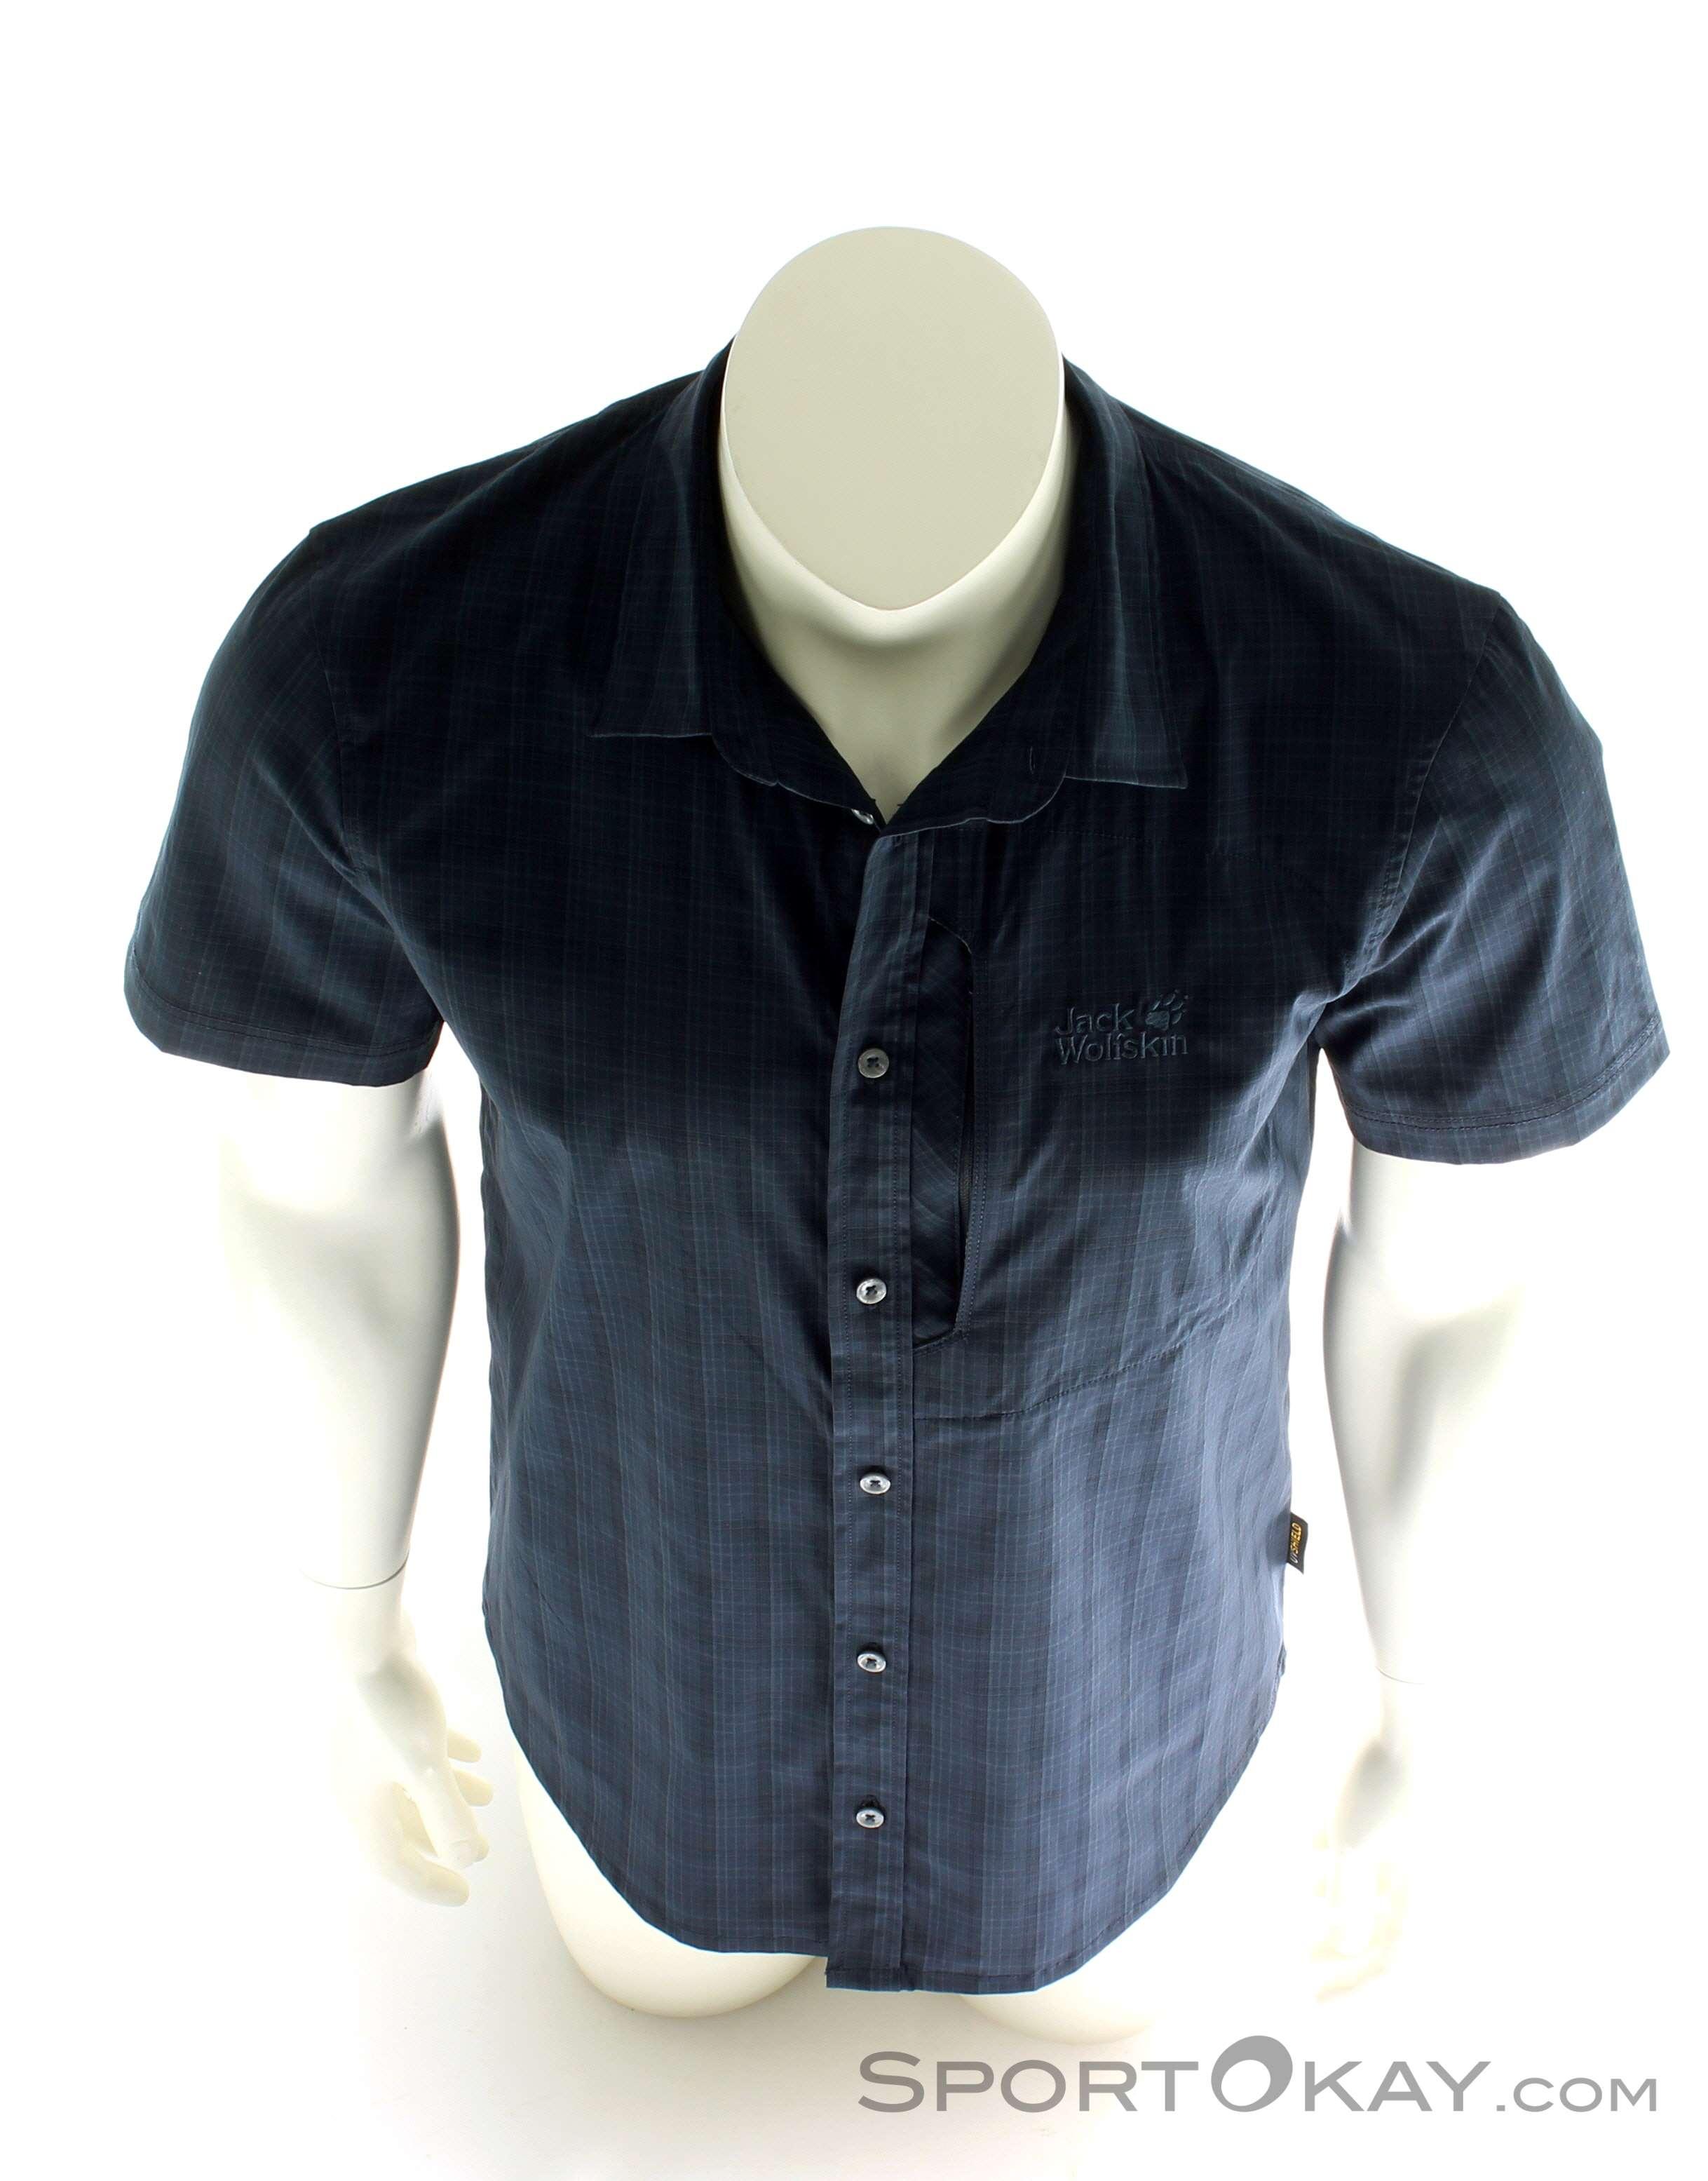 neu kaufen berühmte Designermarke noch nicht vulgär Jack Wolfskin Jack Wolfskin Rays Stretch Vent Mens Outdoor Shirt